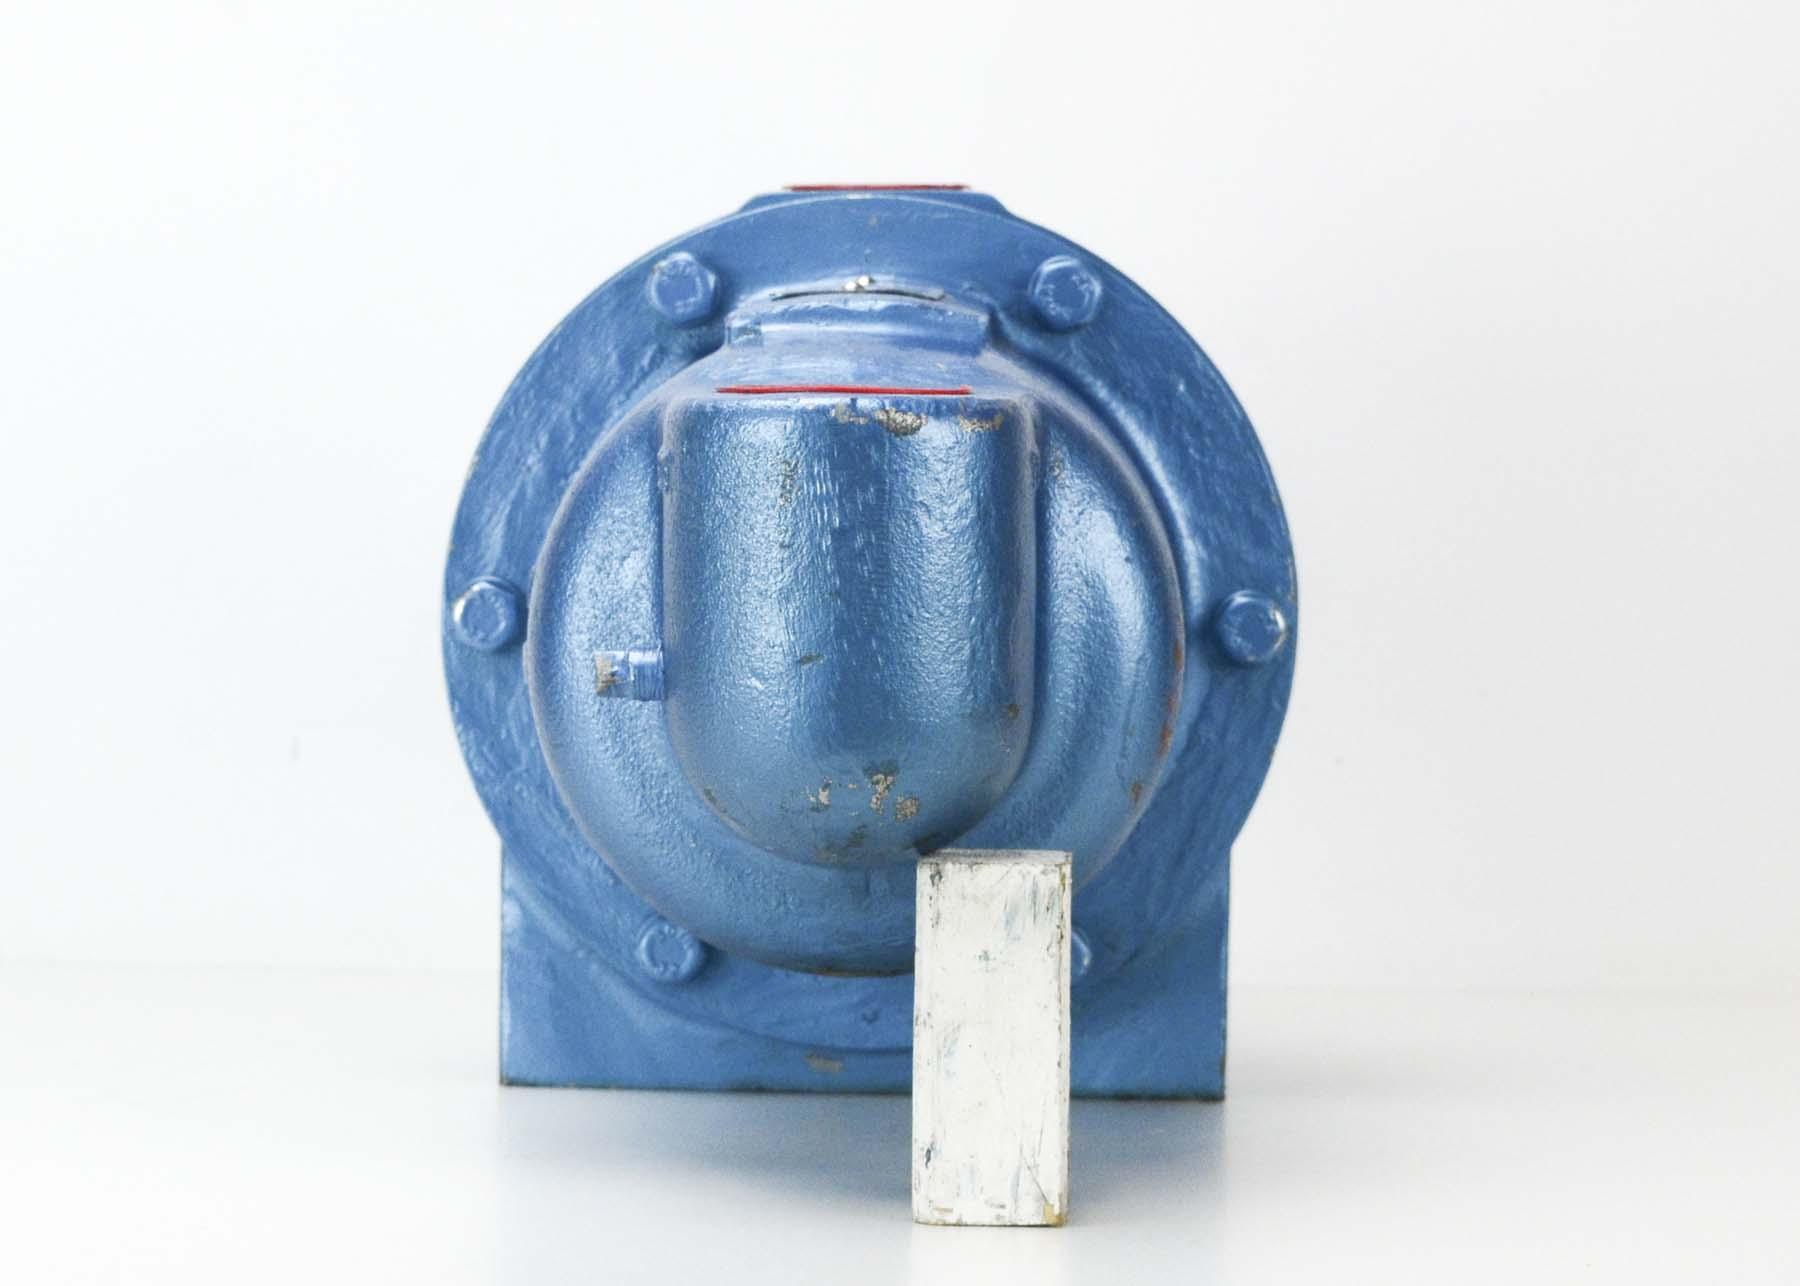 Moyno 35604 Progressive Cavity Pump